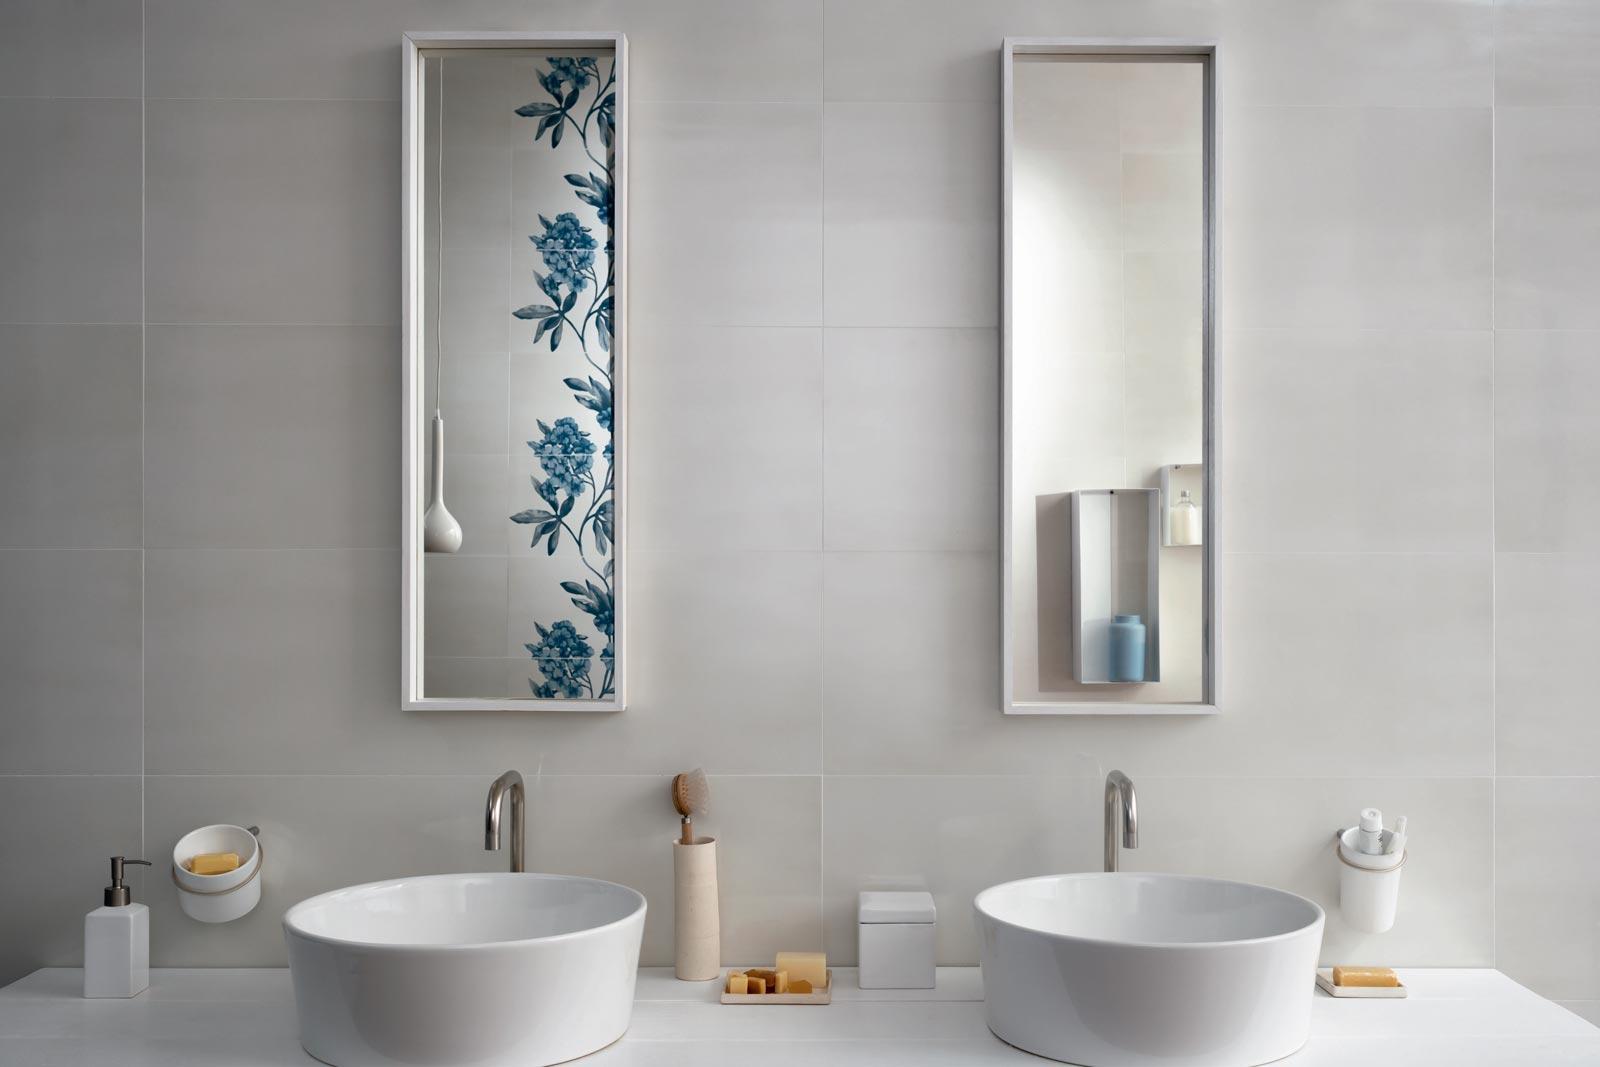 Imperfetto - Coloured porcelain bathroom tiles | Marazzi